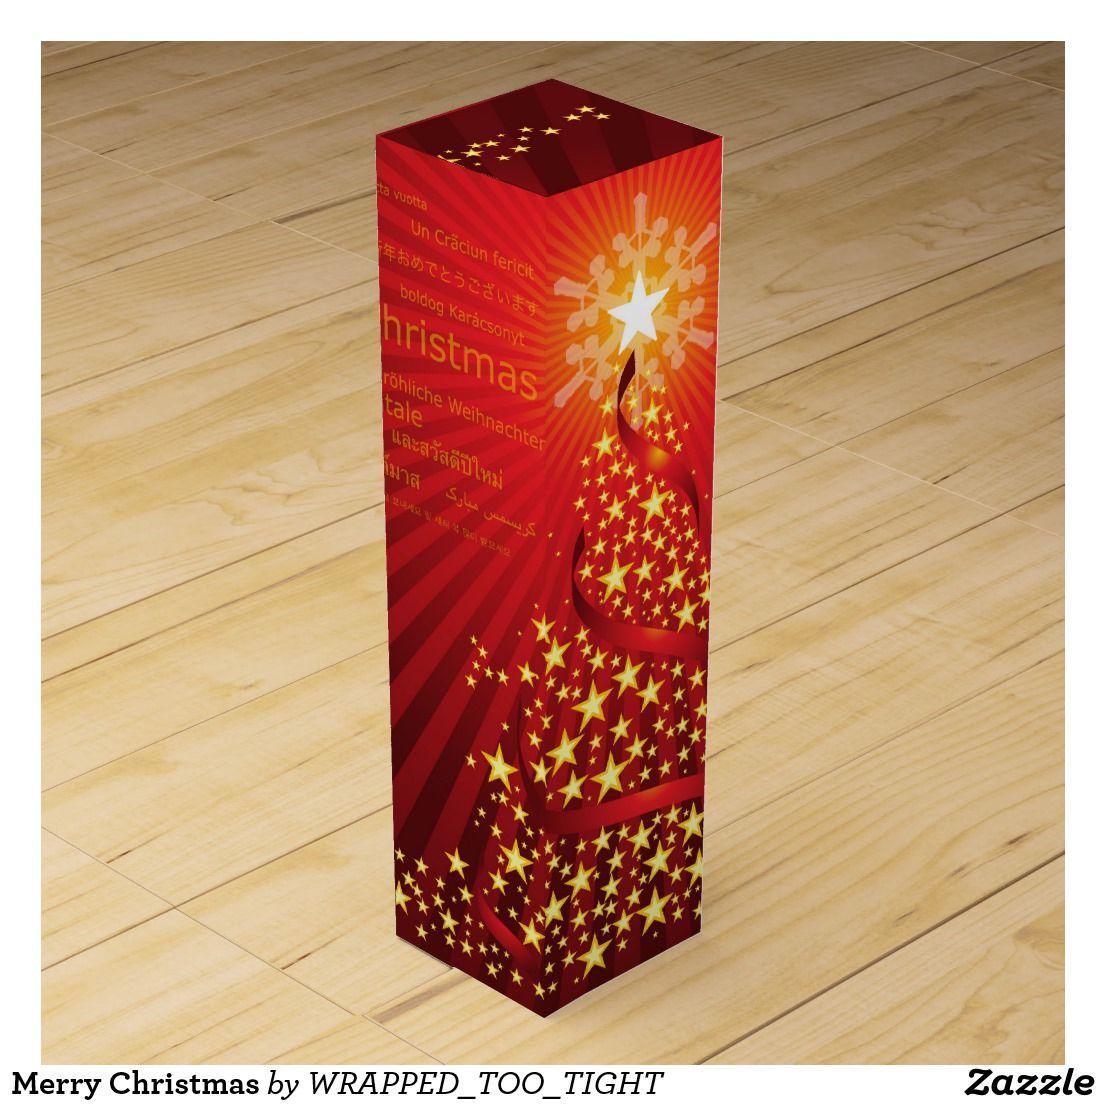 Merry Christmas Wine Gift Box Zazzle Com Wine Christmas Gifts Wine Gift Boxes Wine Gifts